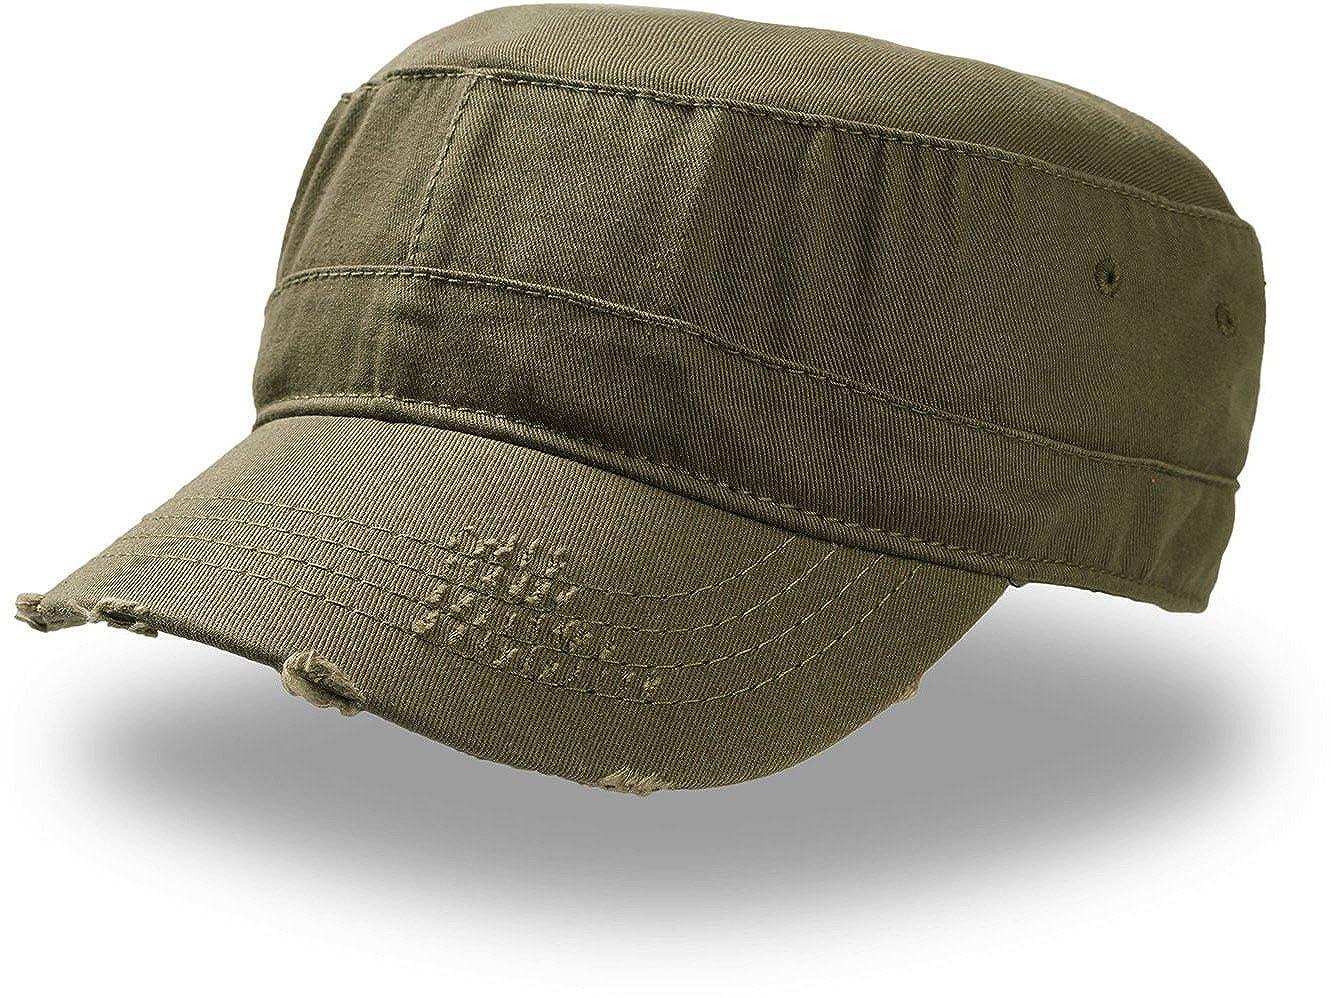 Atlantis Urban Destroyed Military Army Camouflage Camo Hat Cap